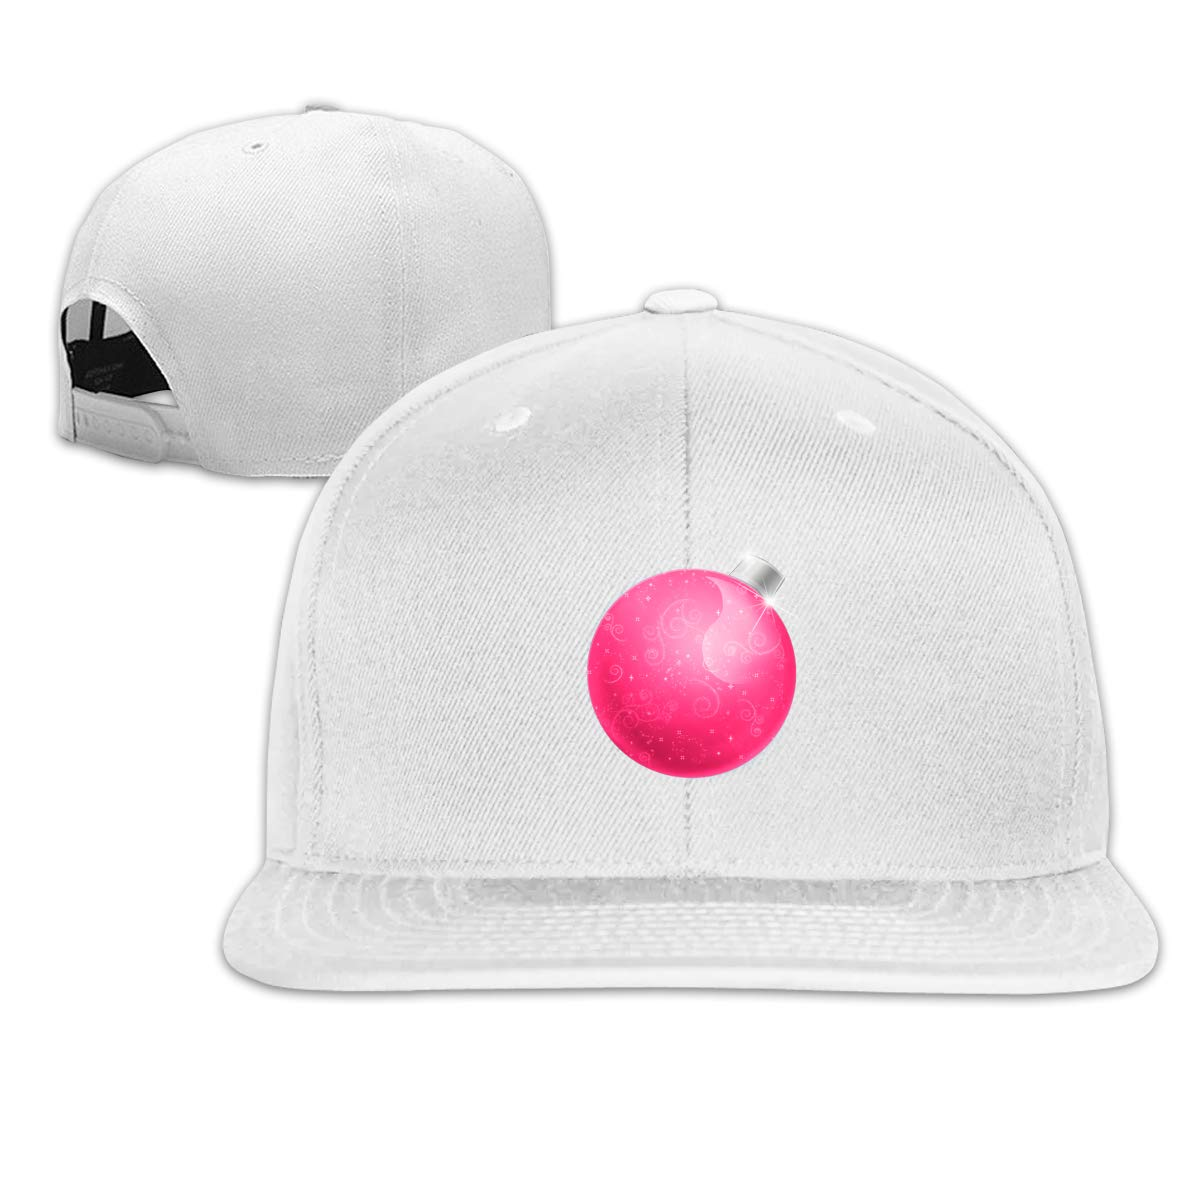 Christmas Ball Flat Brim Baseball Cap Adjustable Snapback Trucker Hat Caps Hip Hop Hat